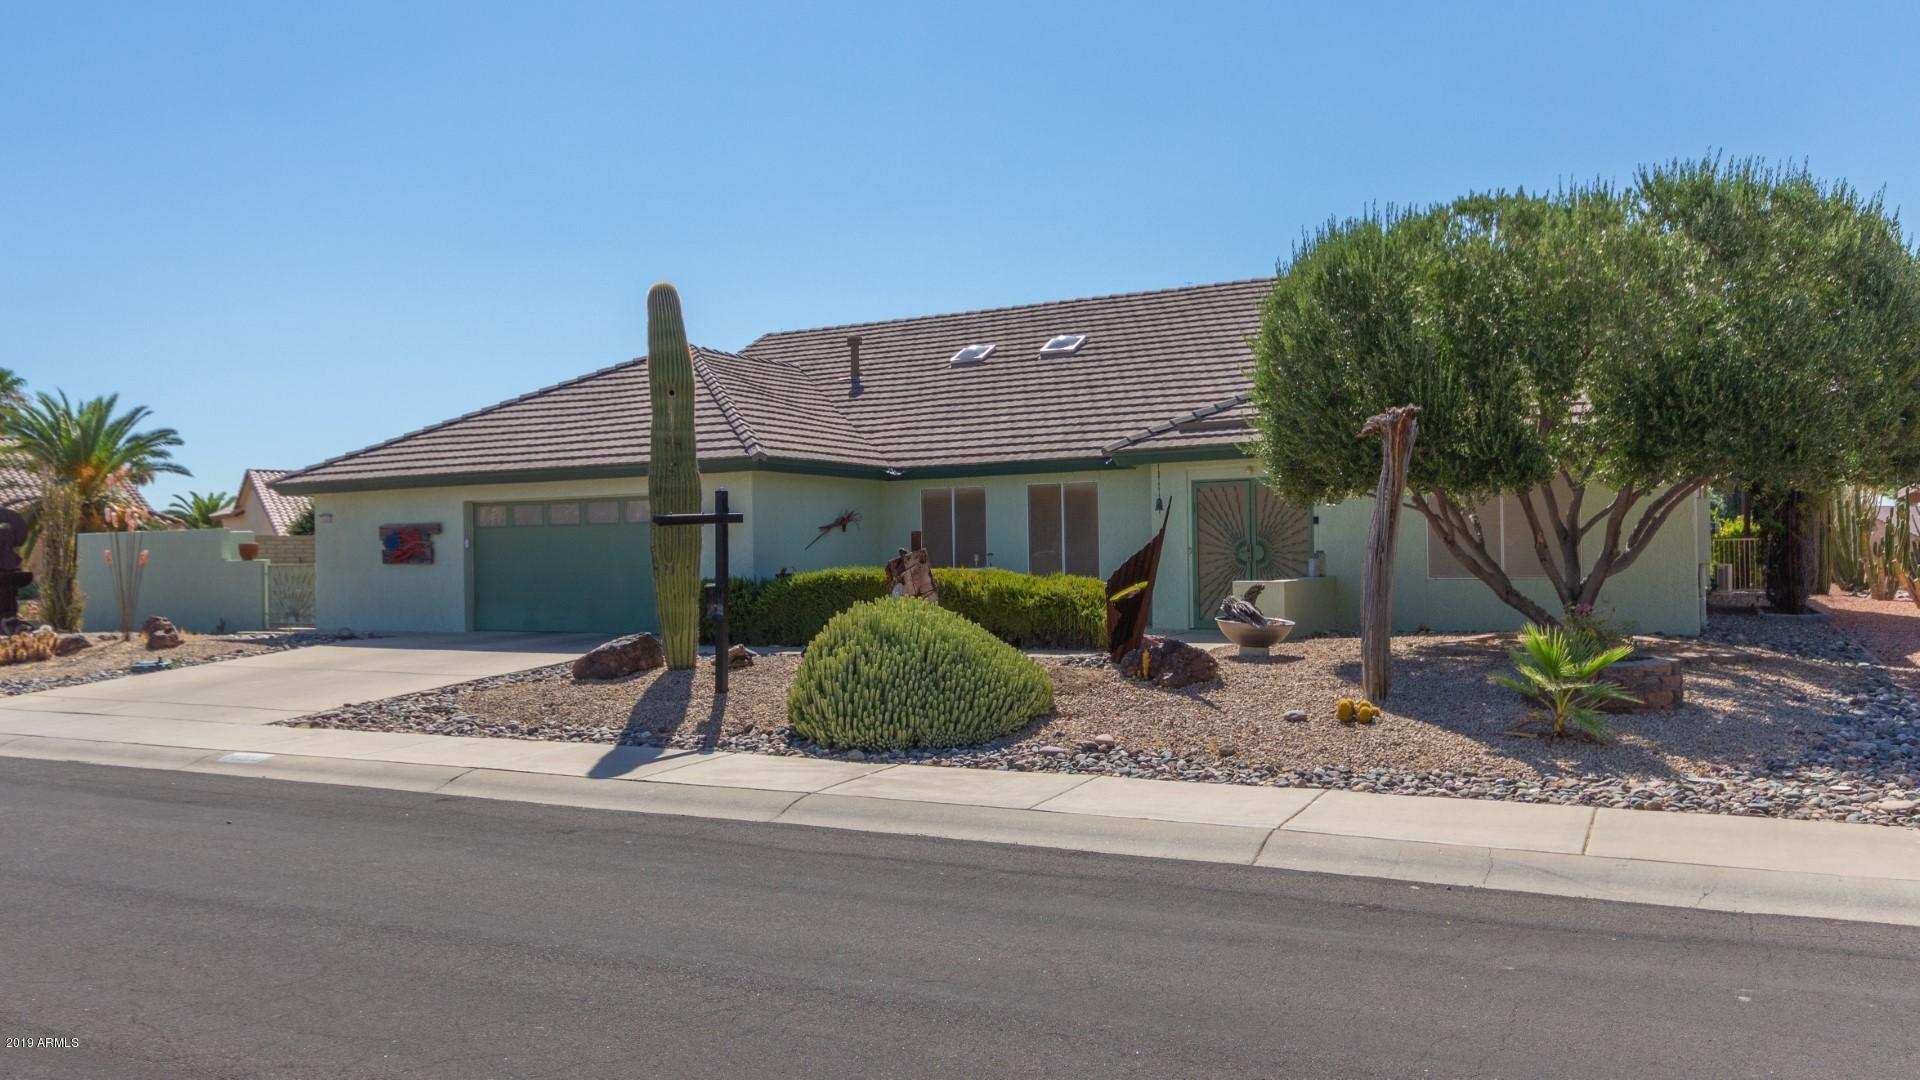 Sun City West AZ 85375 Photo 3